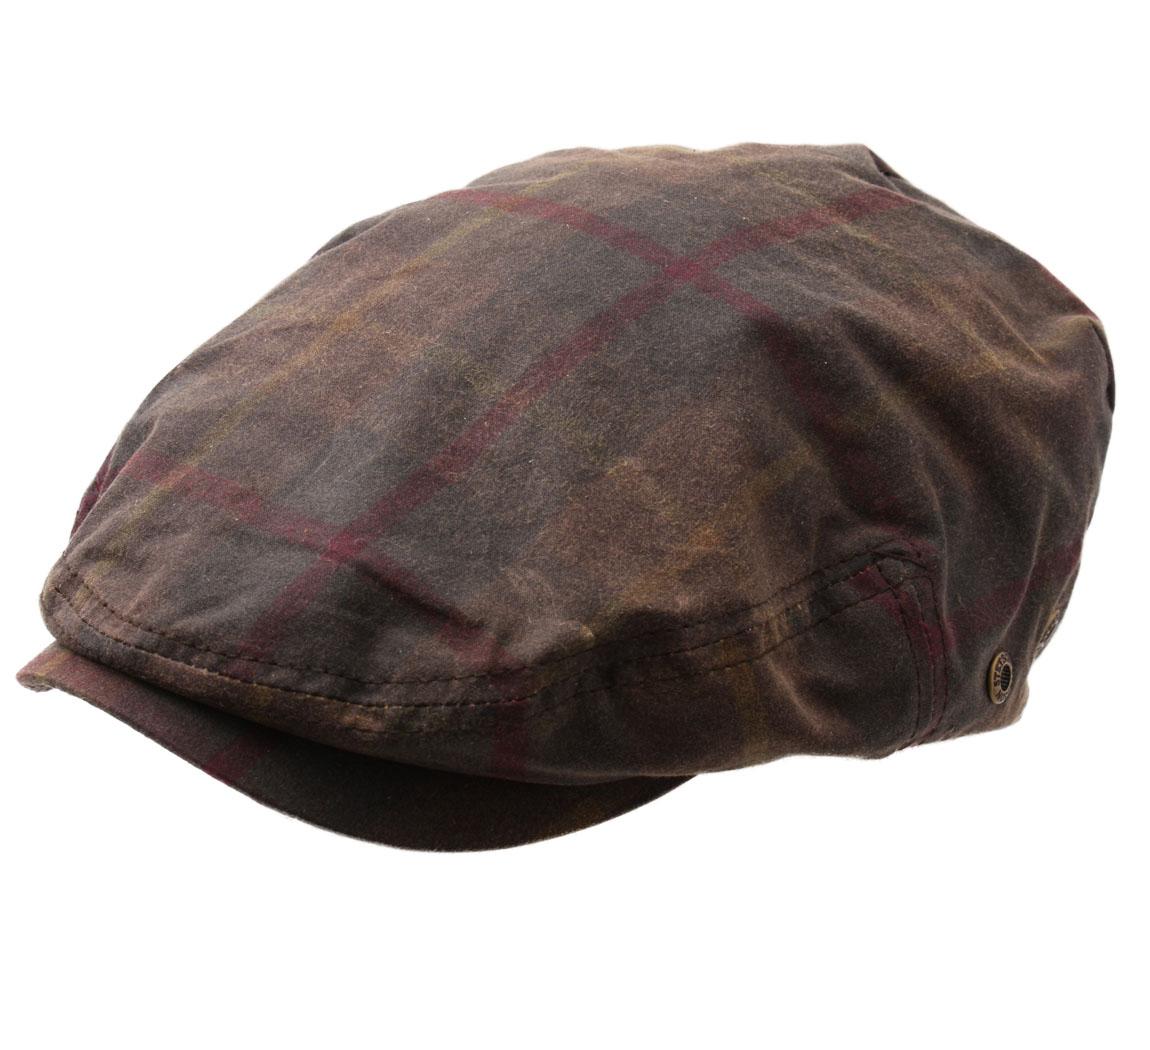 b ret casquette plate homme adin wax casquette. Black Bedroom Furniture Sets. Home Design Ideas